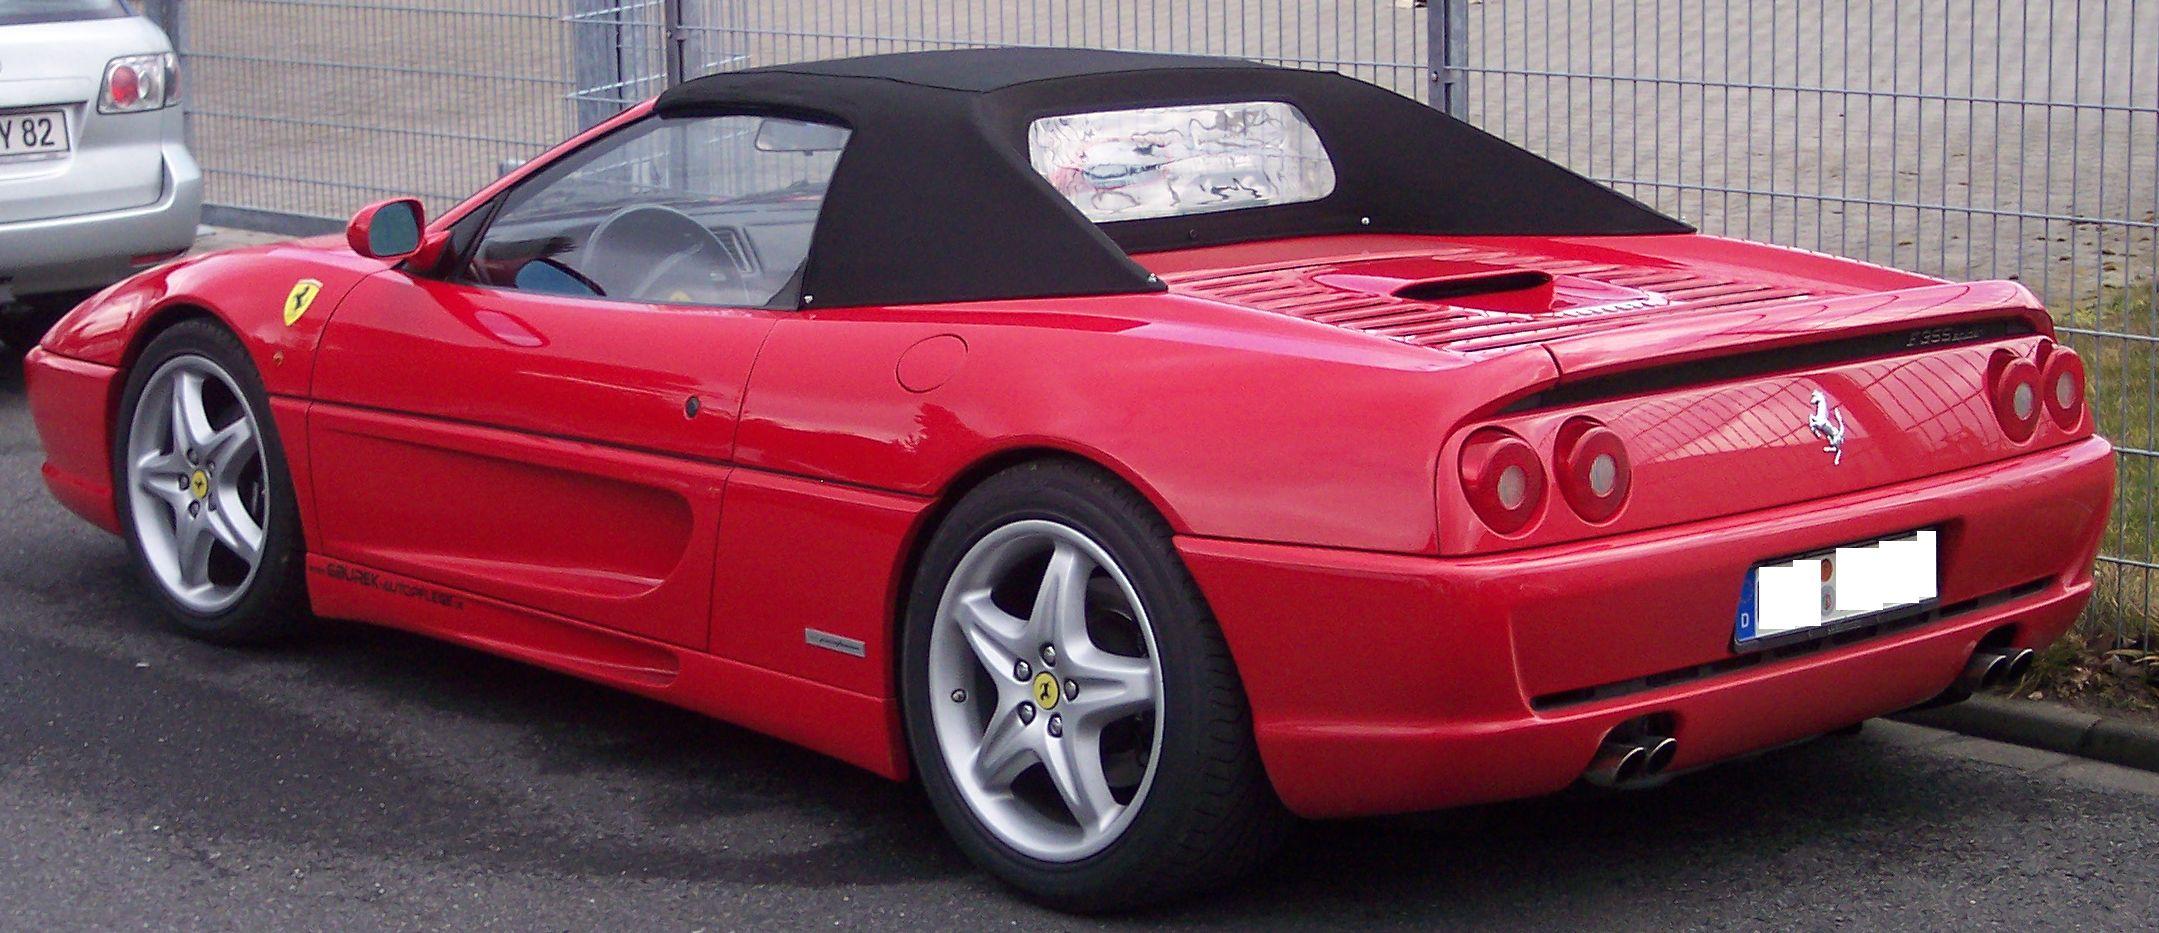 Ferrari F355 Spider Picture 8 Reviews News Specs Buy Car